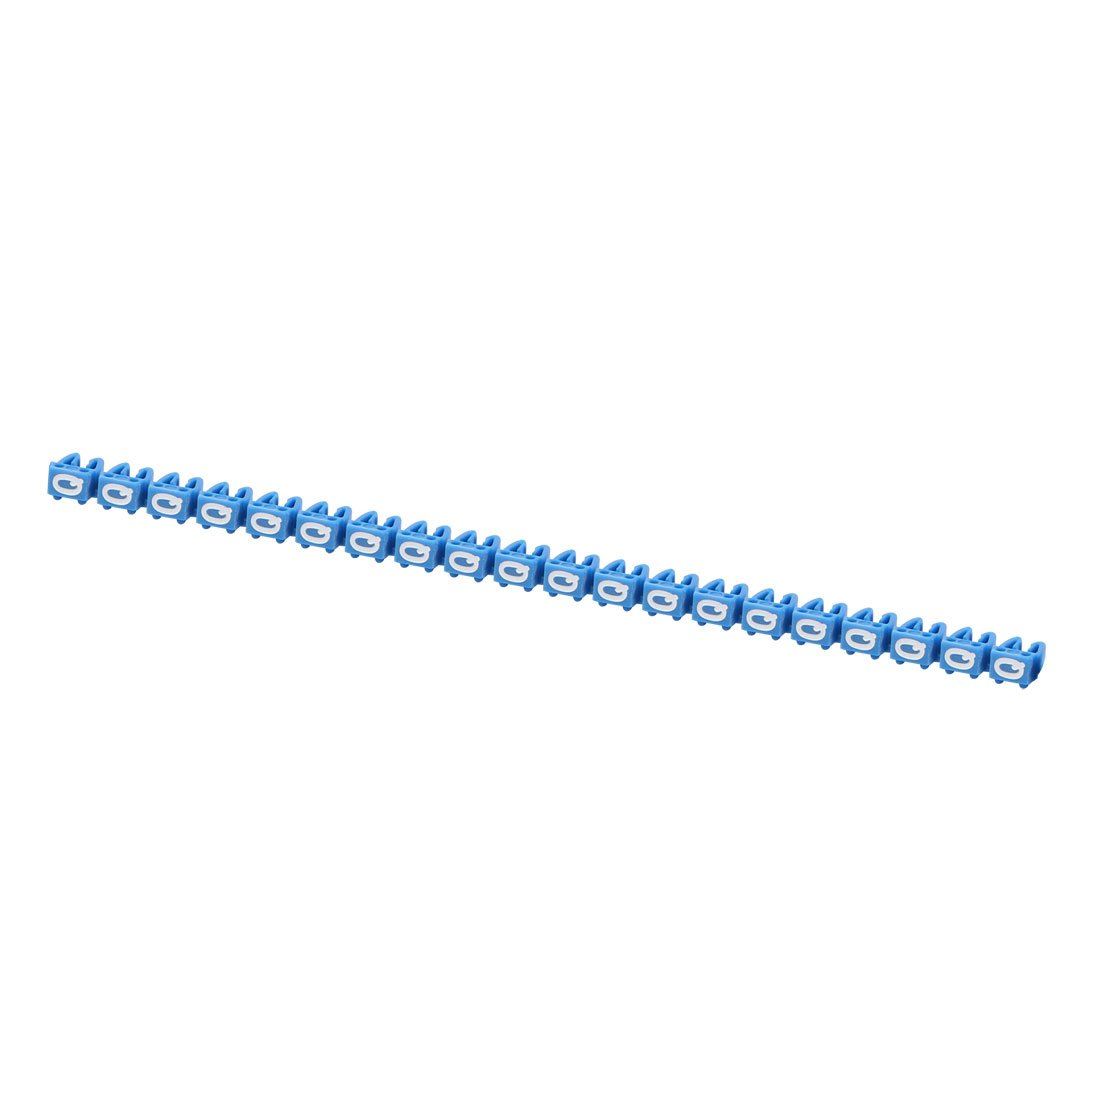 sourcing map 20Pcs Etiquetas DE 3.0-4.0mm de di/ámetro de Cable Letras L Cable de Red Azul para marcadores